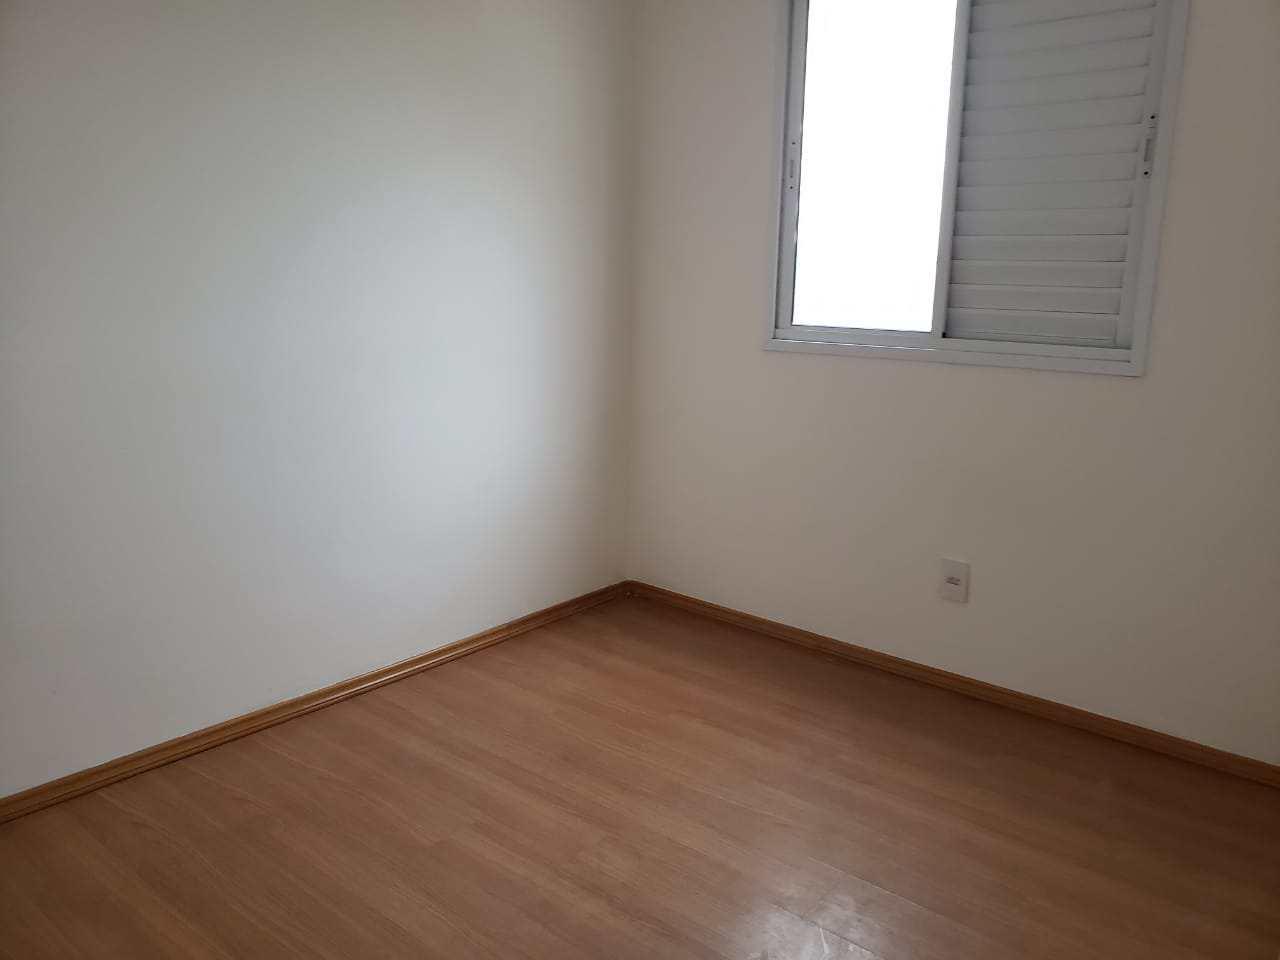 Apartamento com 2 dorms, Cidade Satélite Santa Bárbara, São Paulo - R$ 190 mil, Cod: 11359